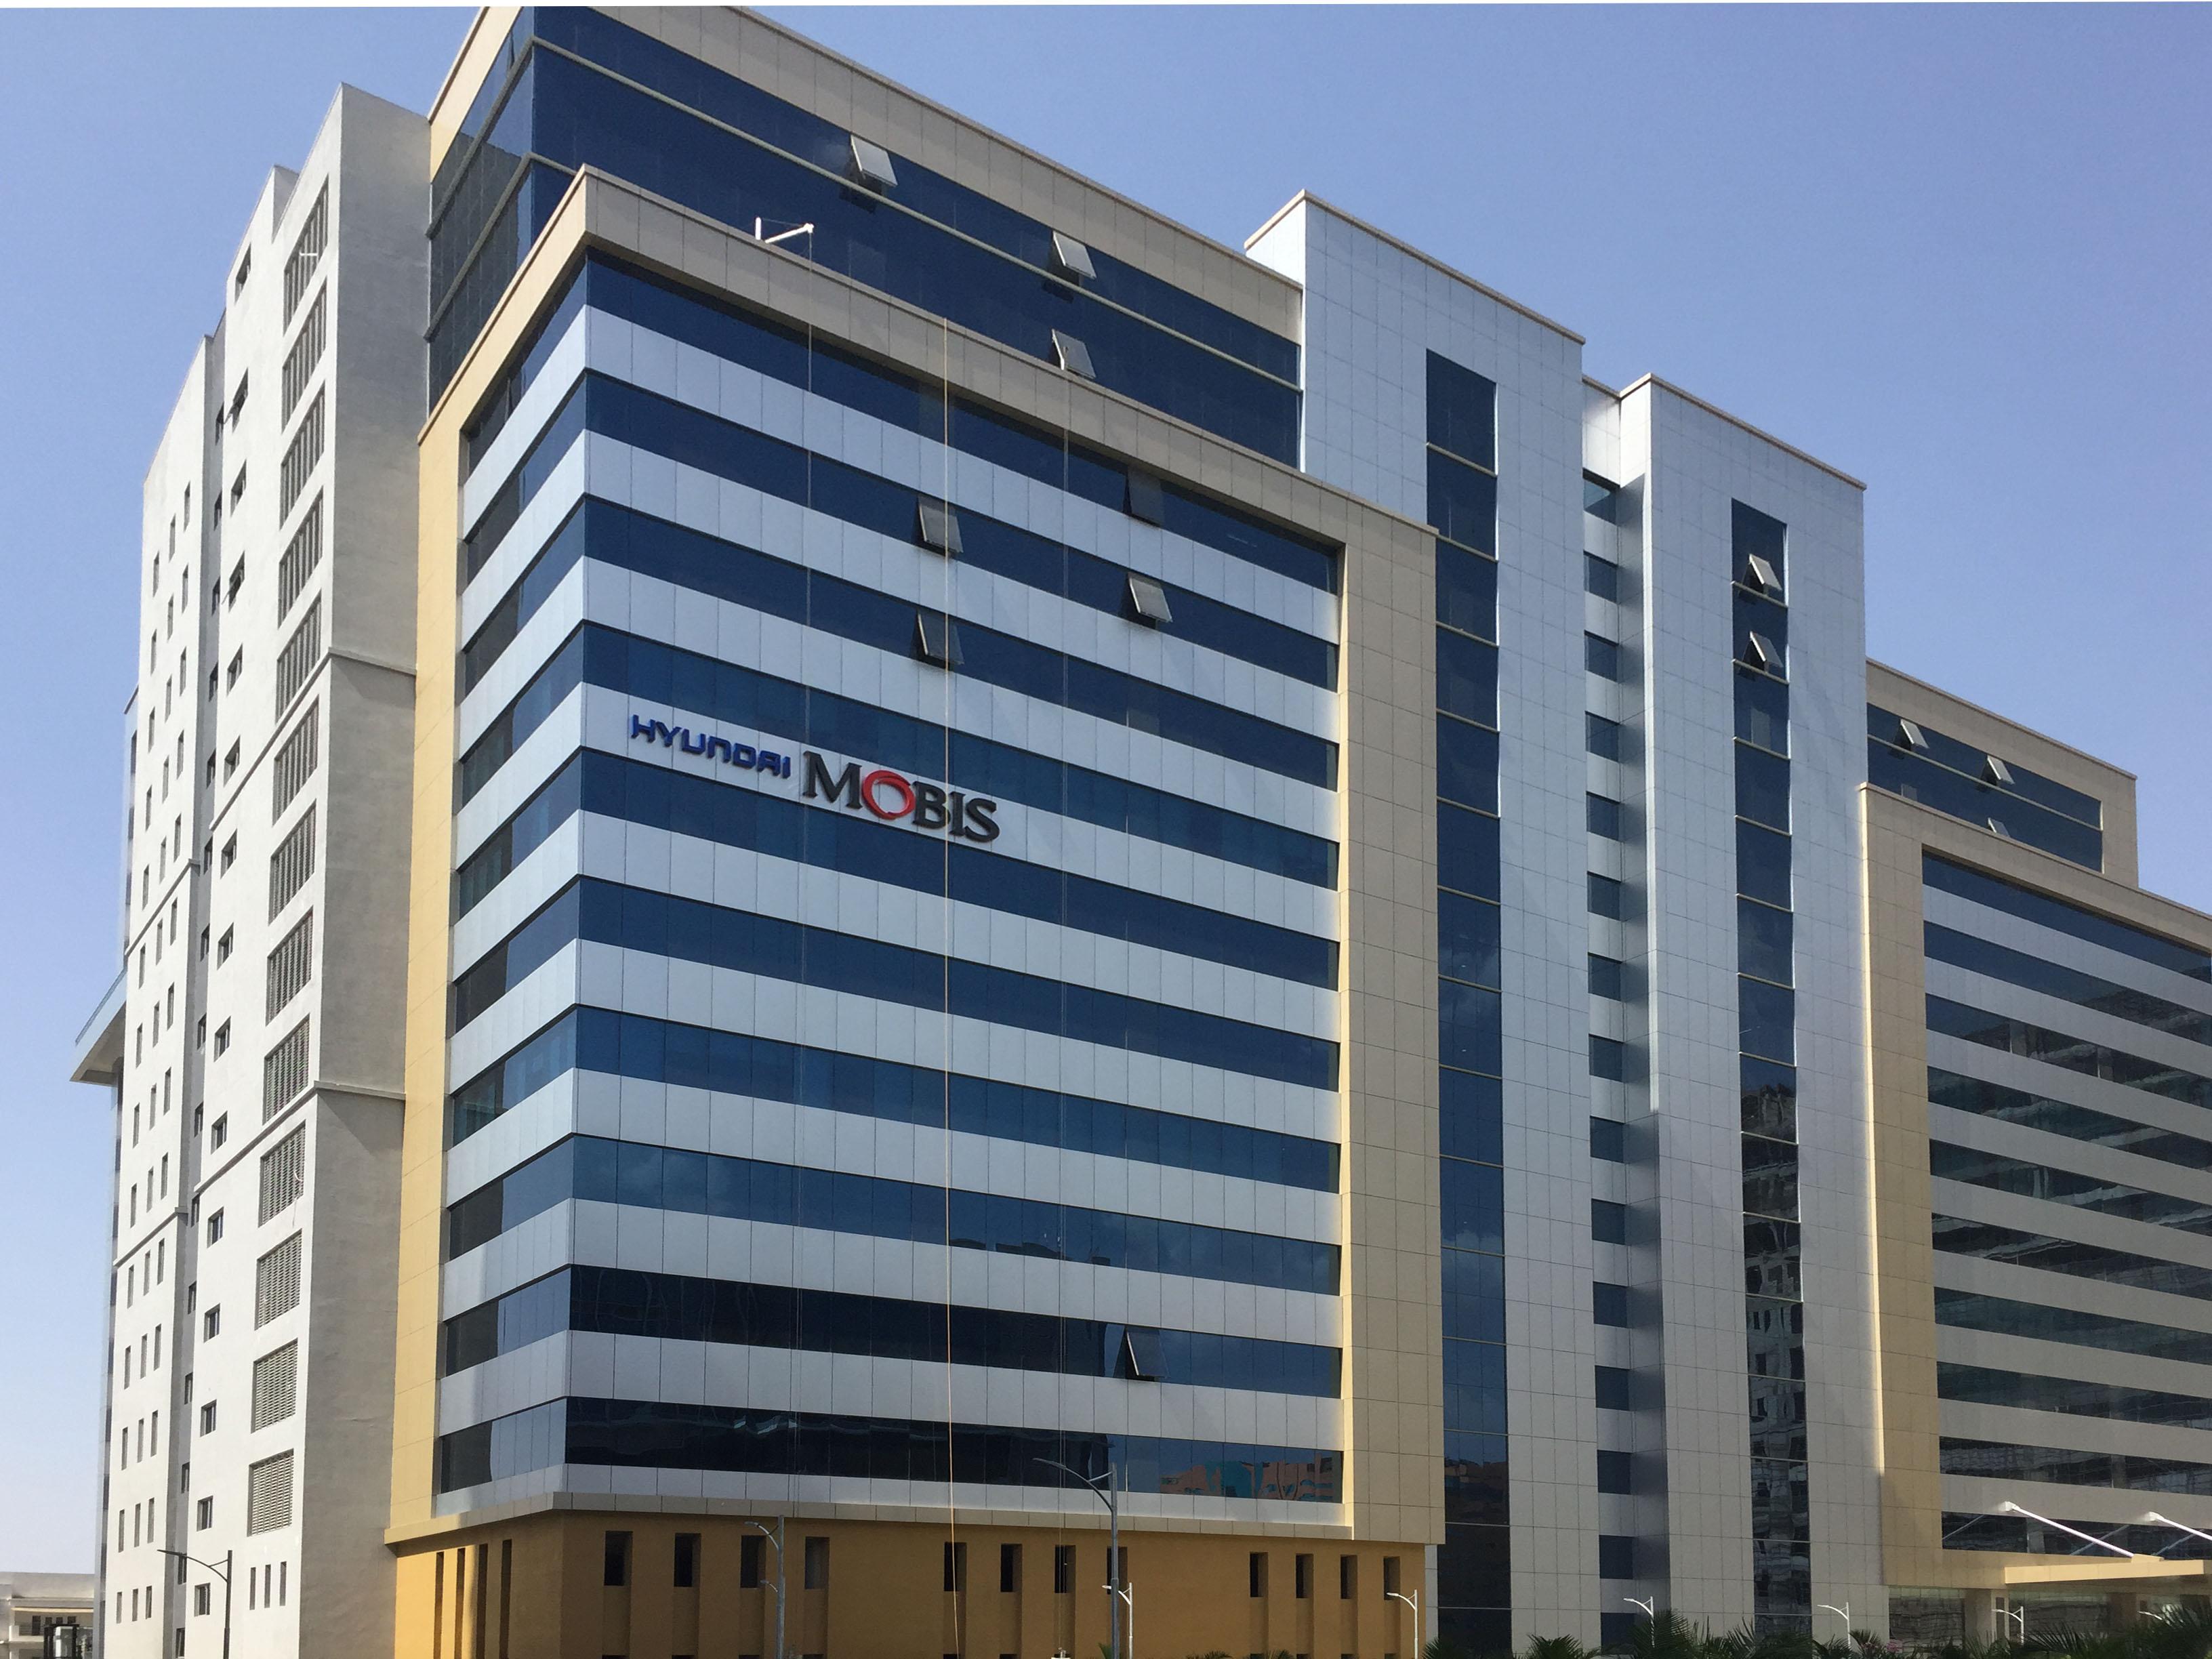 Hyundai Mobis to Establish Car Software Research Center in